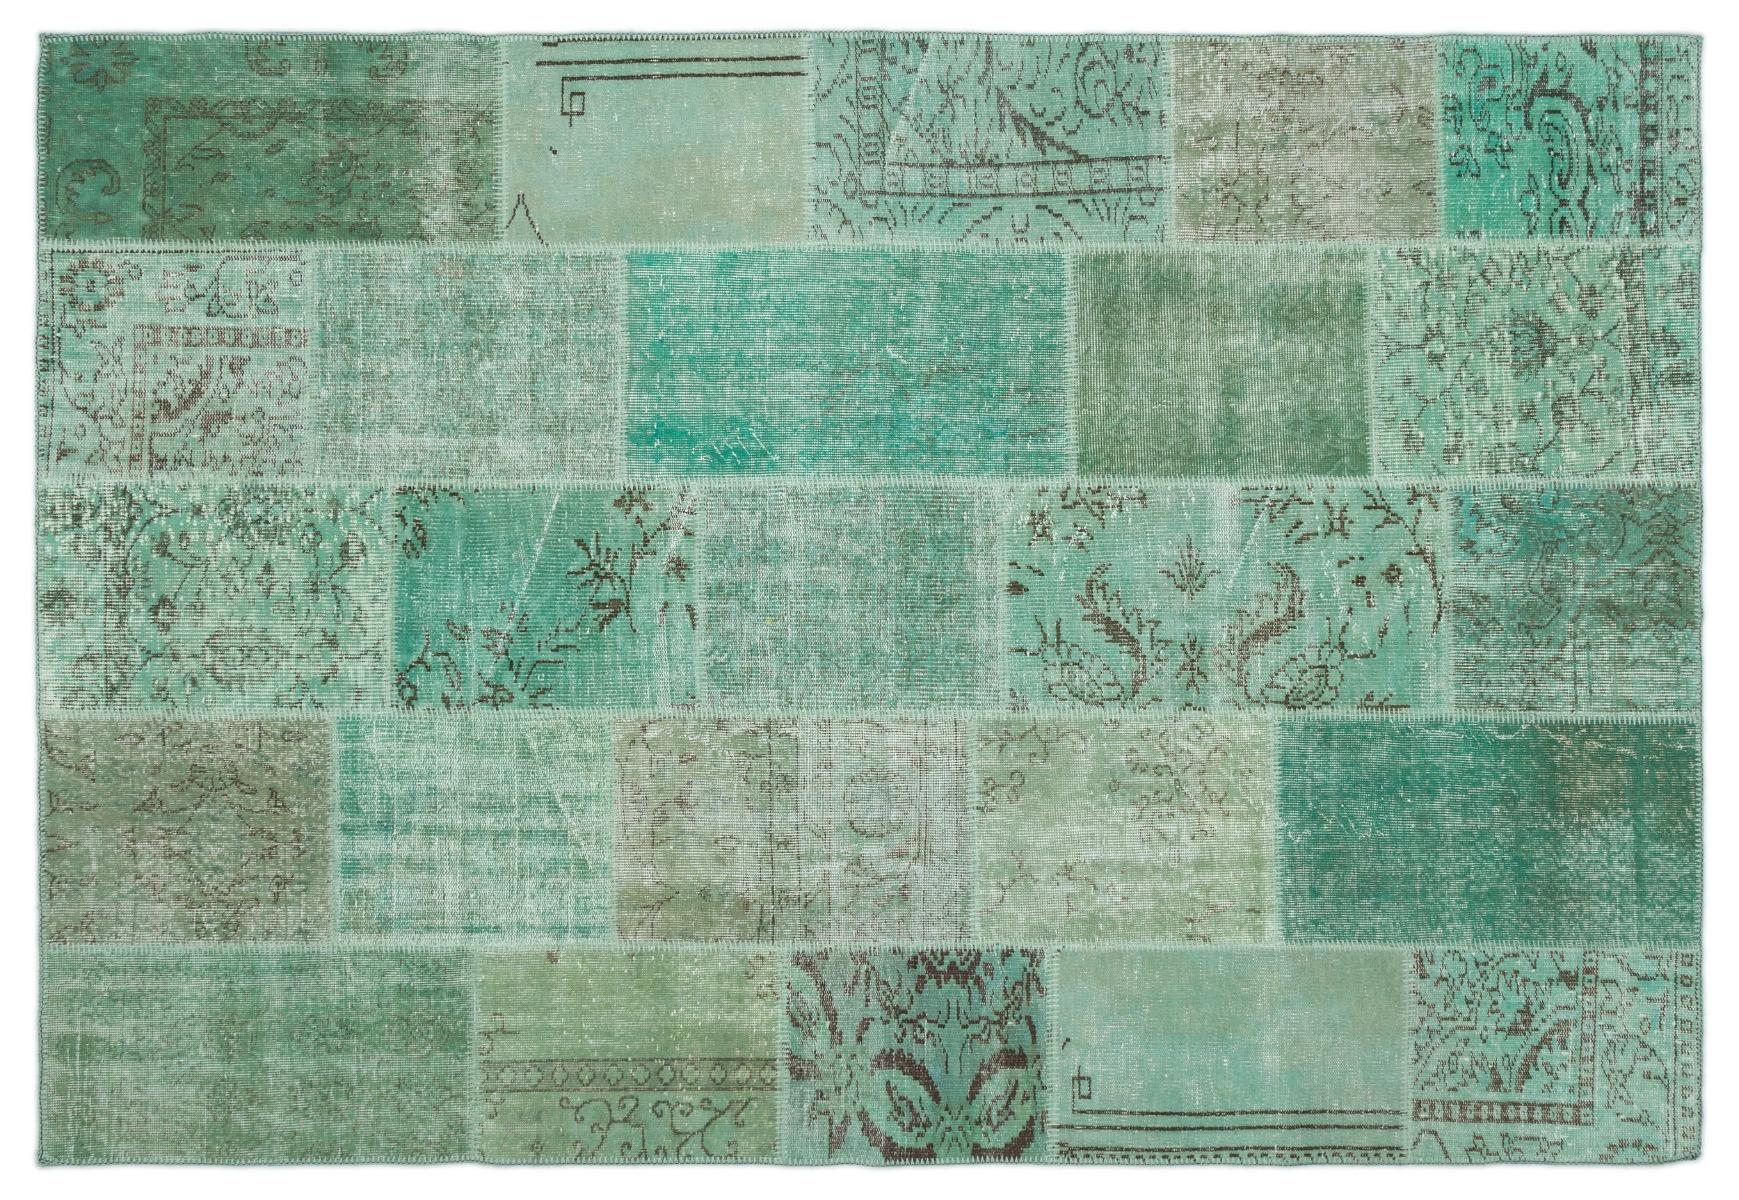 patchwork vloerkleed groen nr.20868 282cm x 195cm